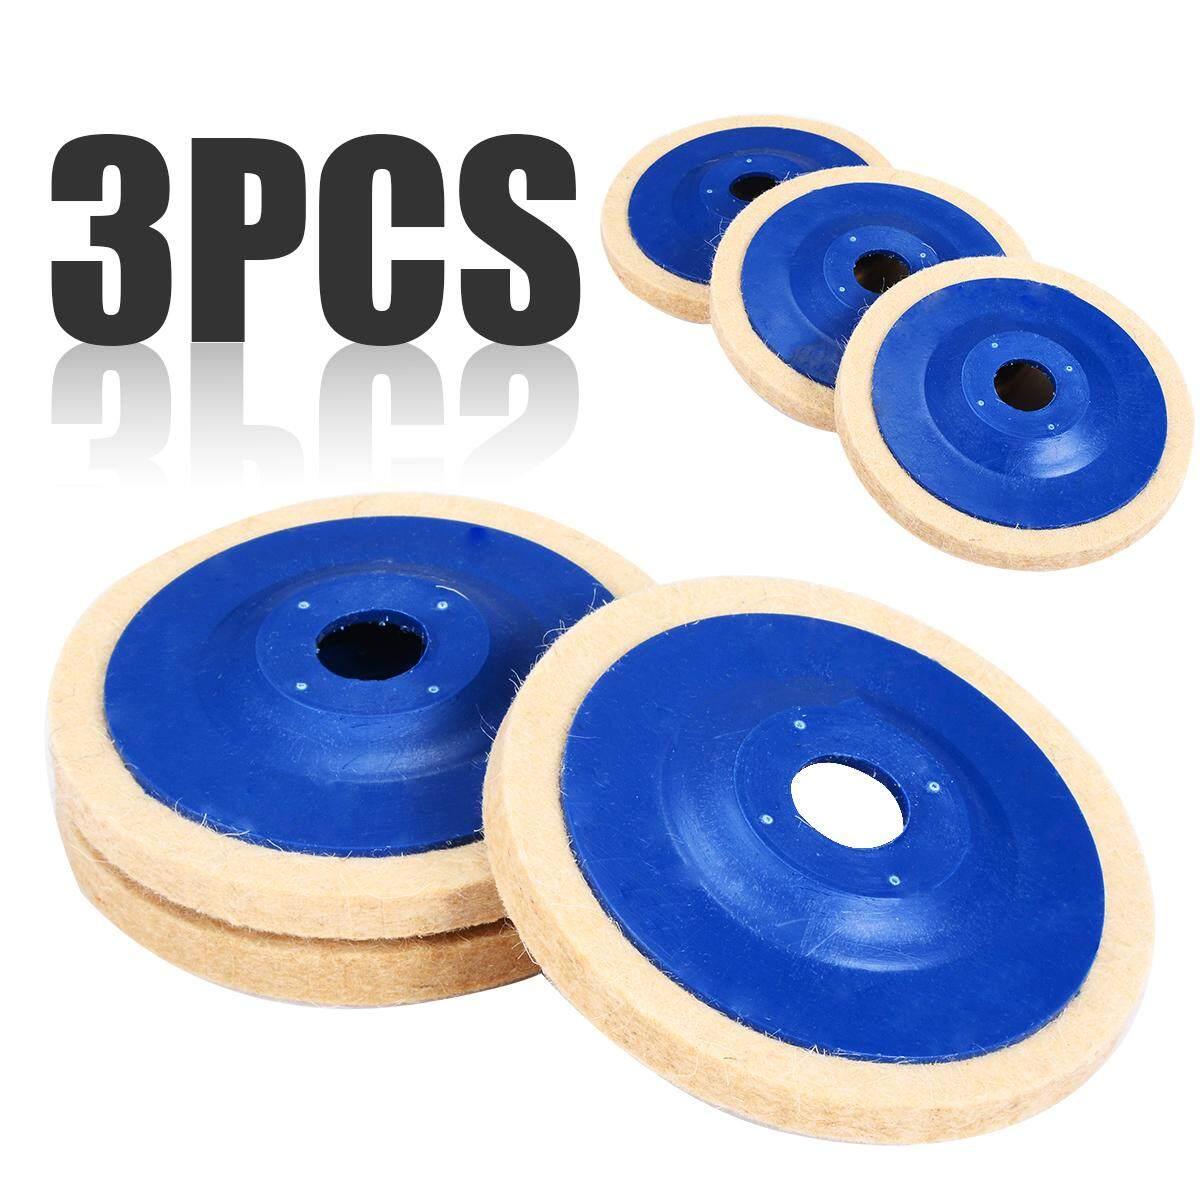 BOKLAI 3pcs 100mm 4inch Wool Buffing Grinding Wheel Felt Polishing Discs Pads Set Blue